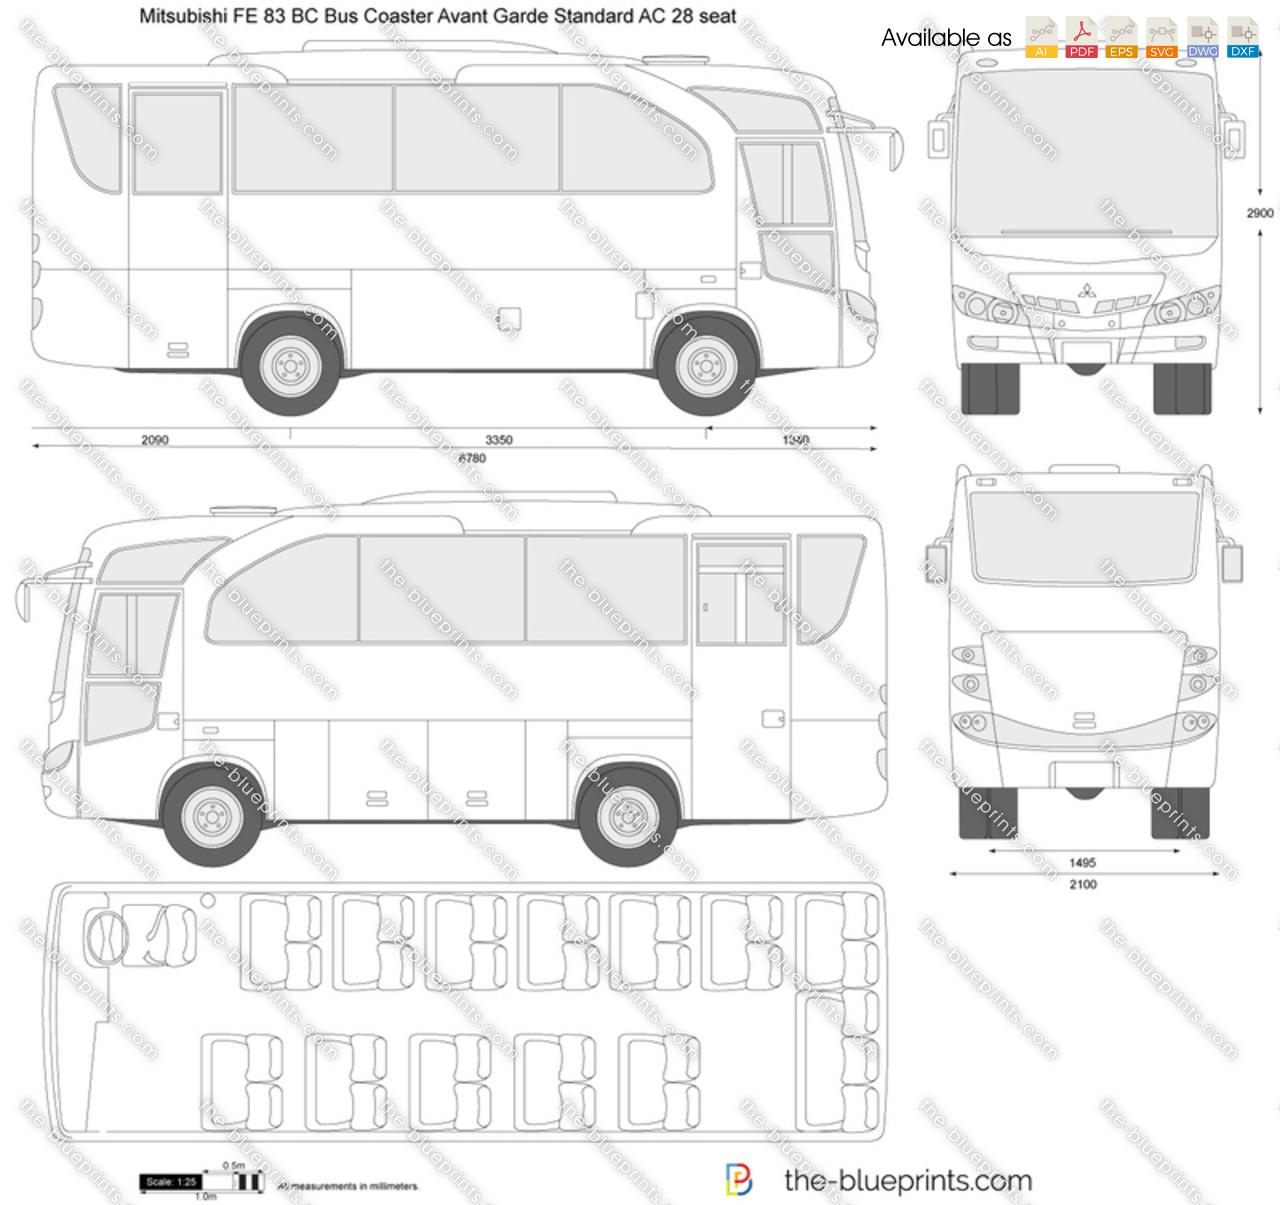 Mitsubishi FE 83 BC Bus Coaster Avant Garde Standard AC 28 seat